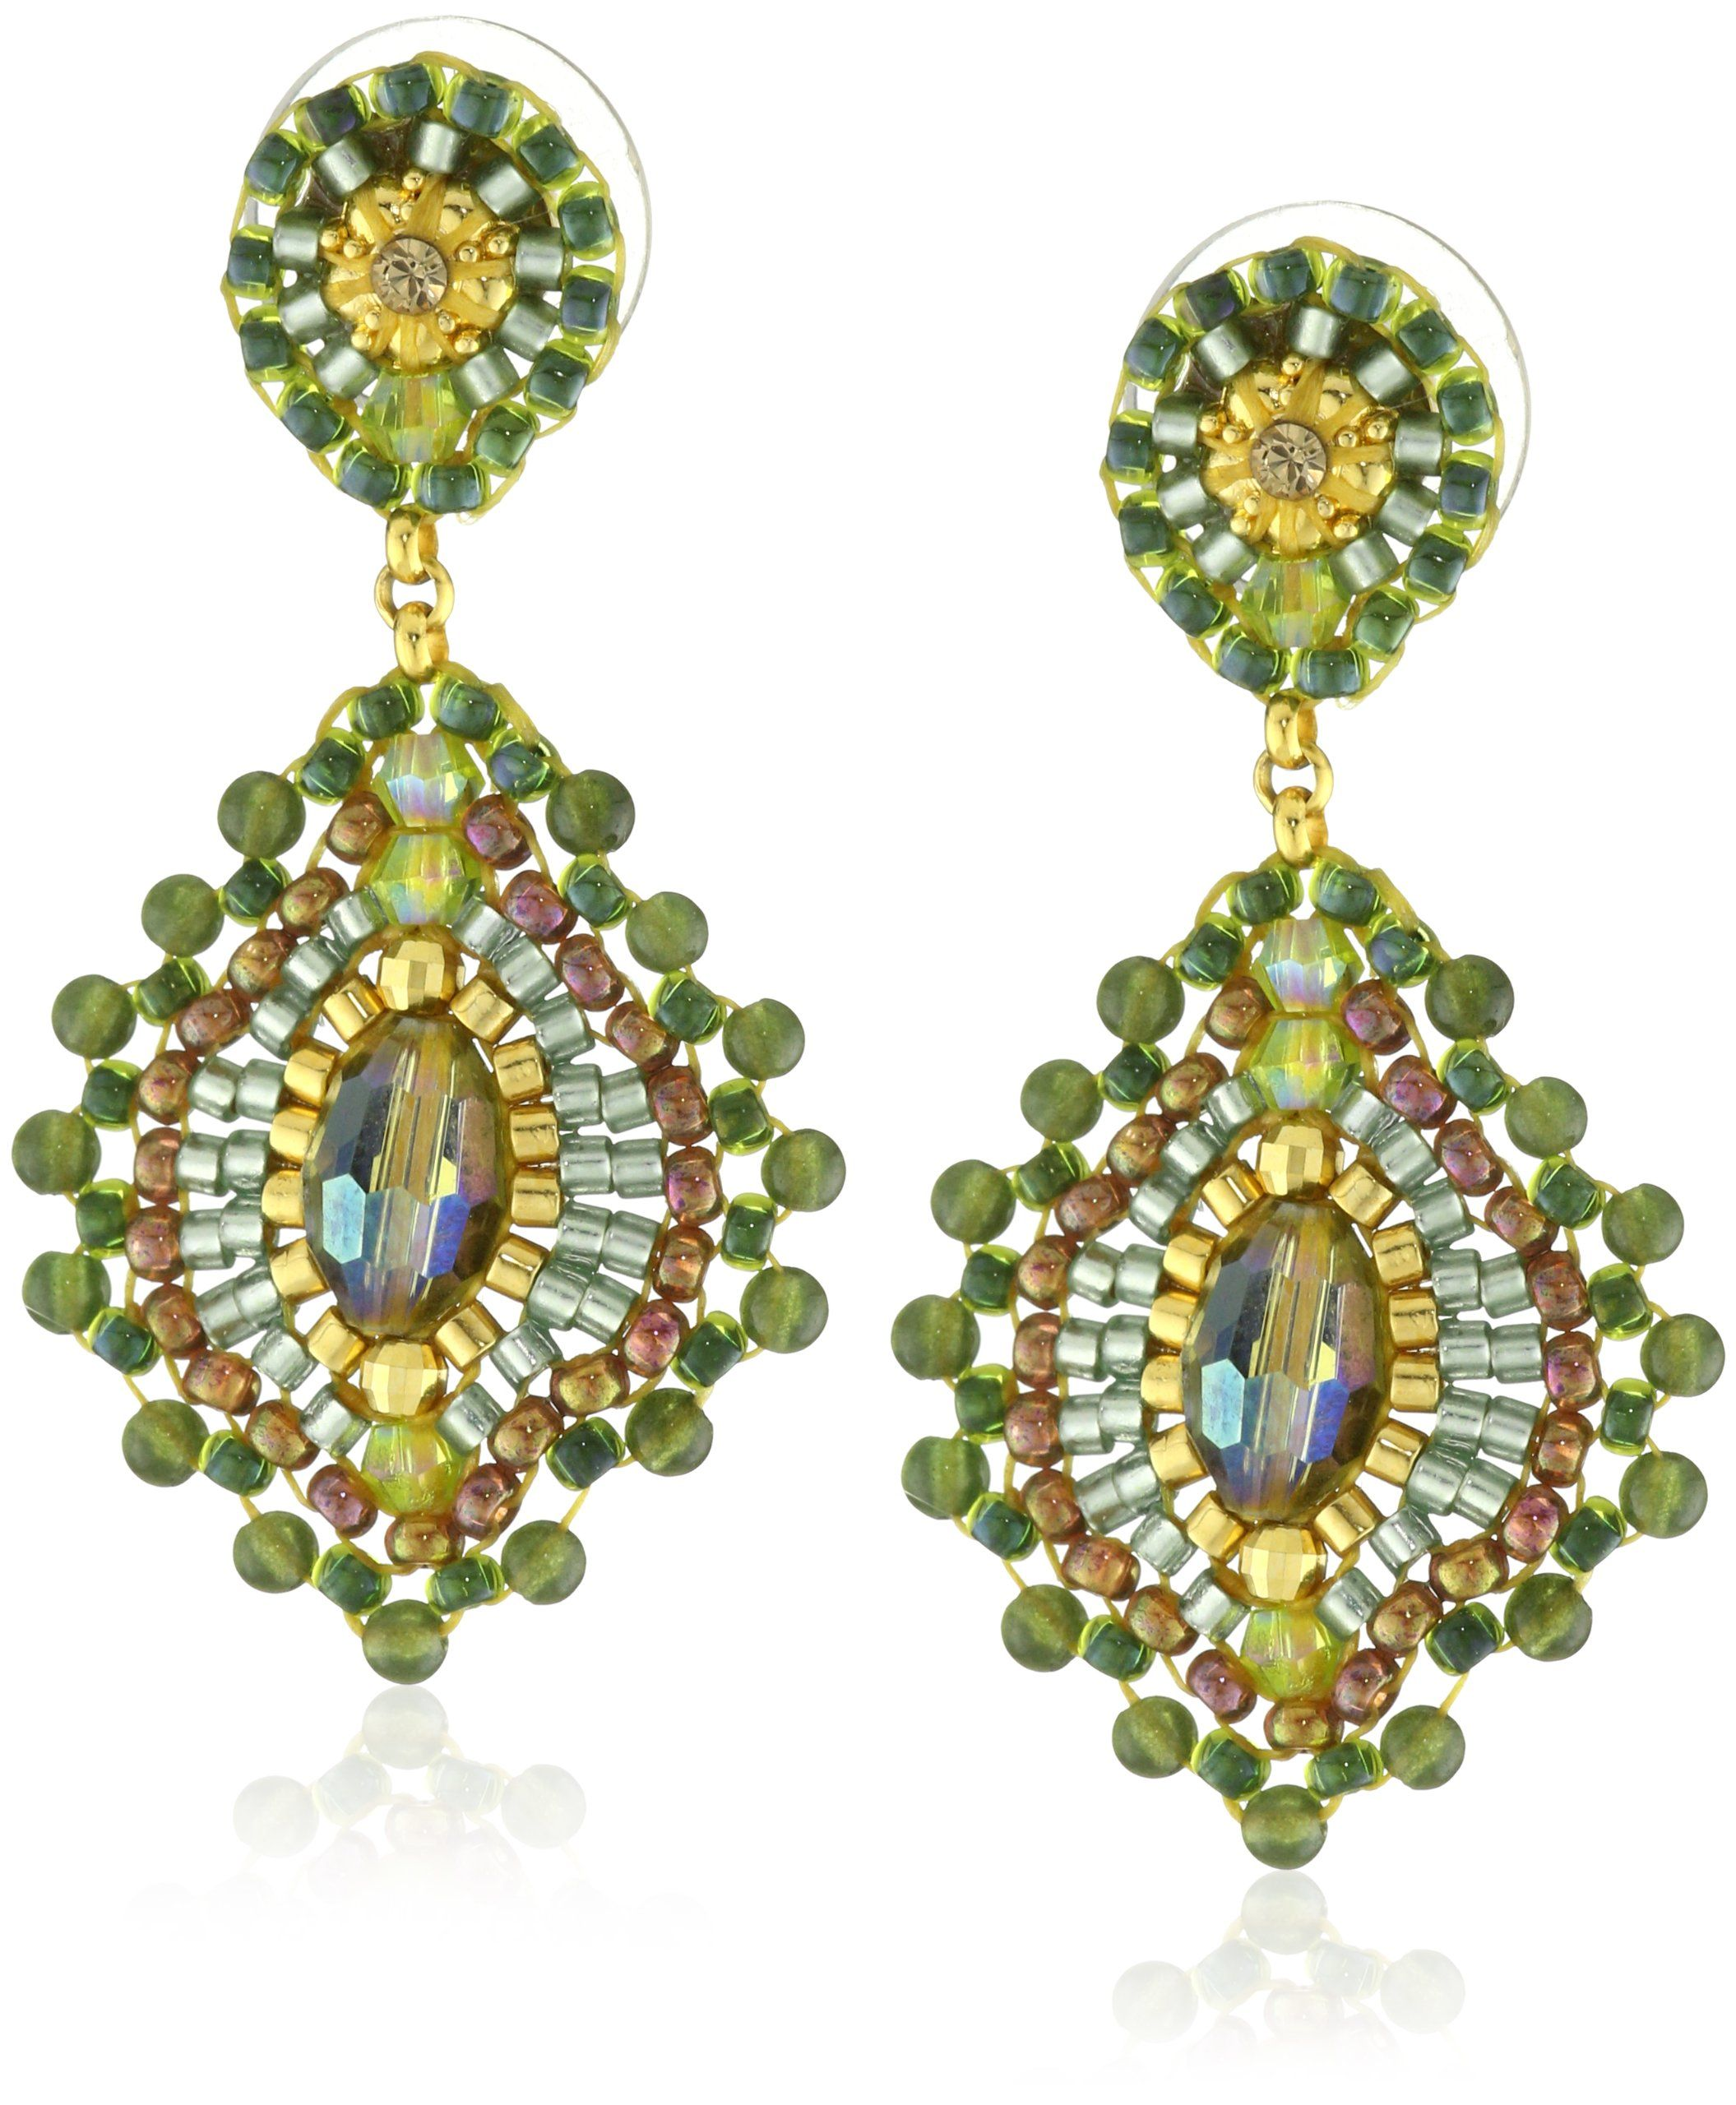 83dea253e9a8 Miguel Ases Small Green Jade Lotus Drop Earrings Miguelitos